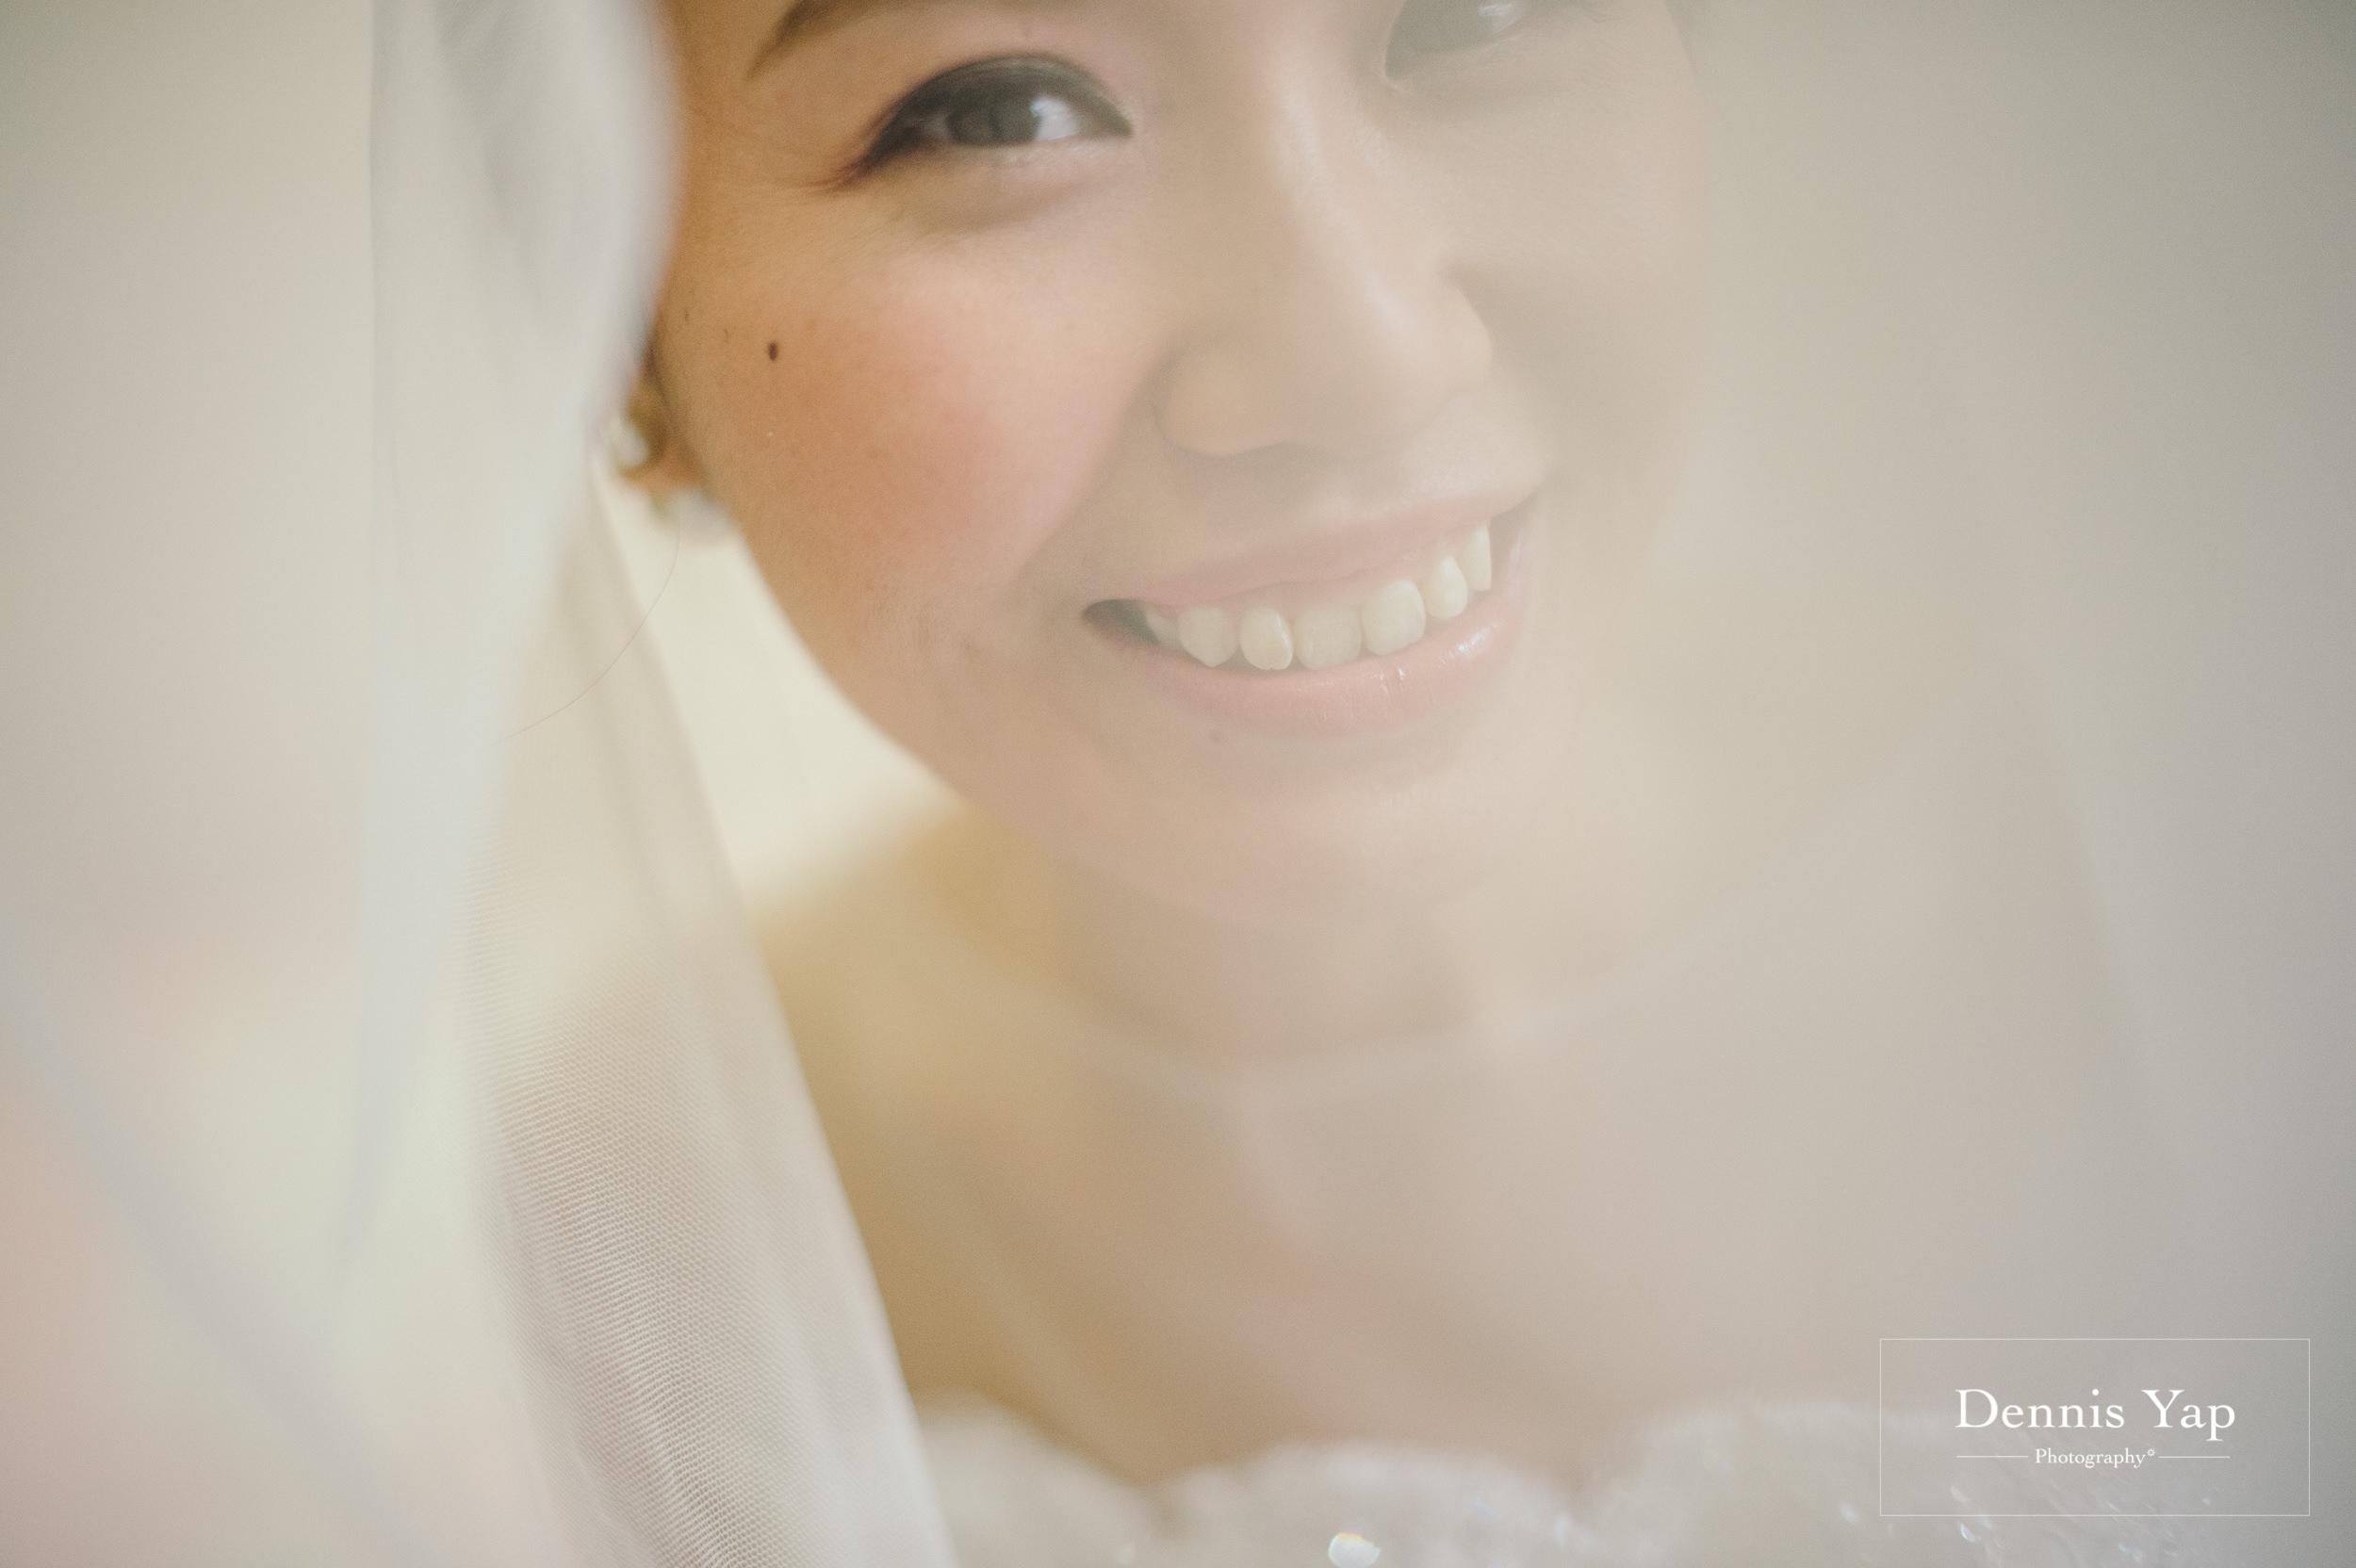 danny sherine wedding day group photo dennis yap photography usj heights malaysia top wedding photographer-6.jpg